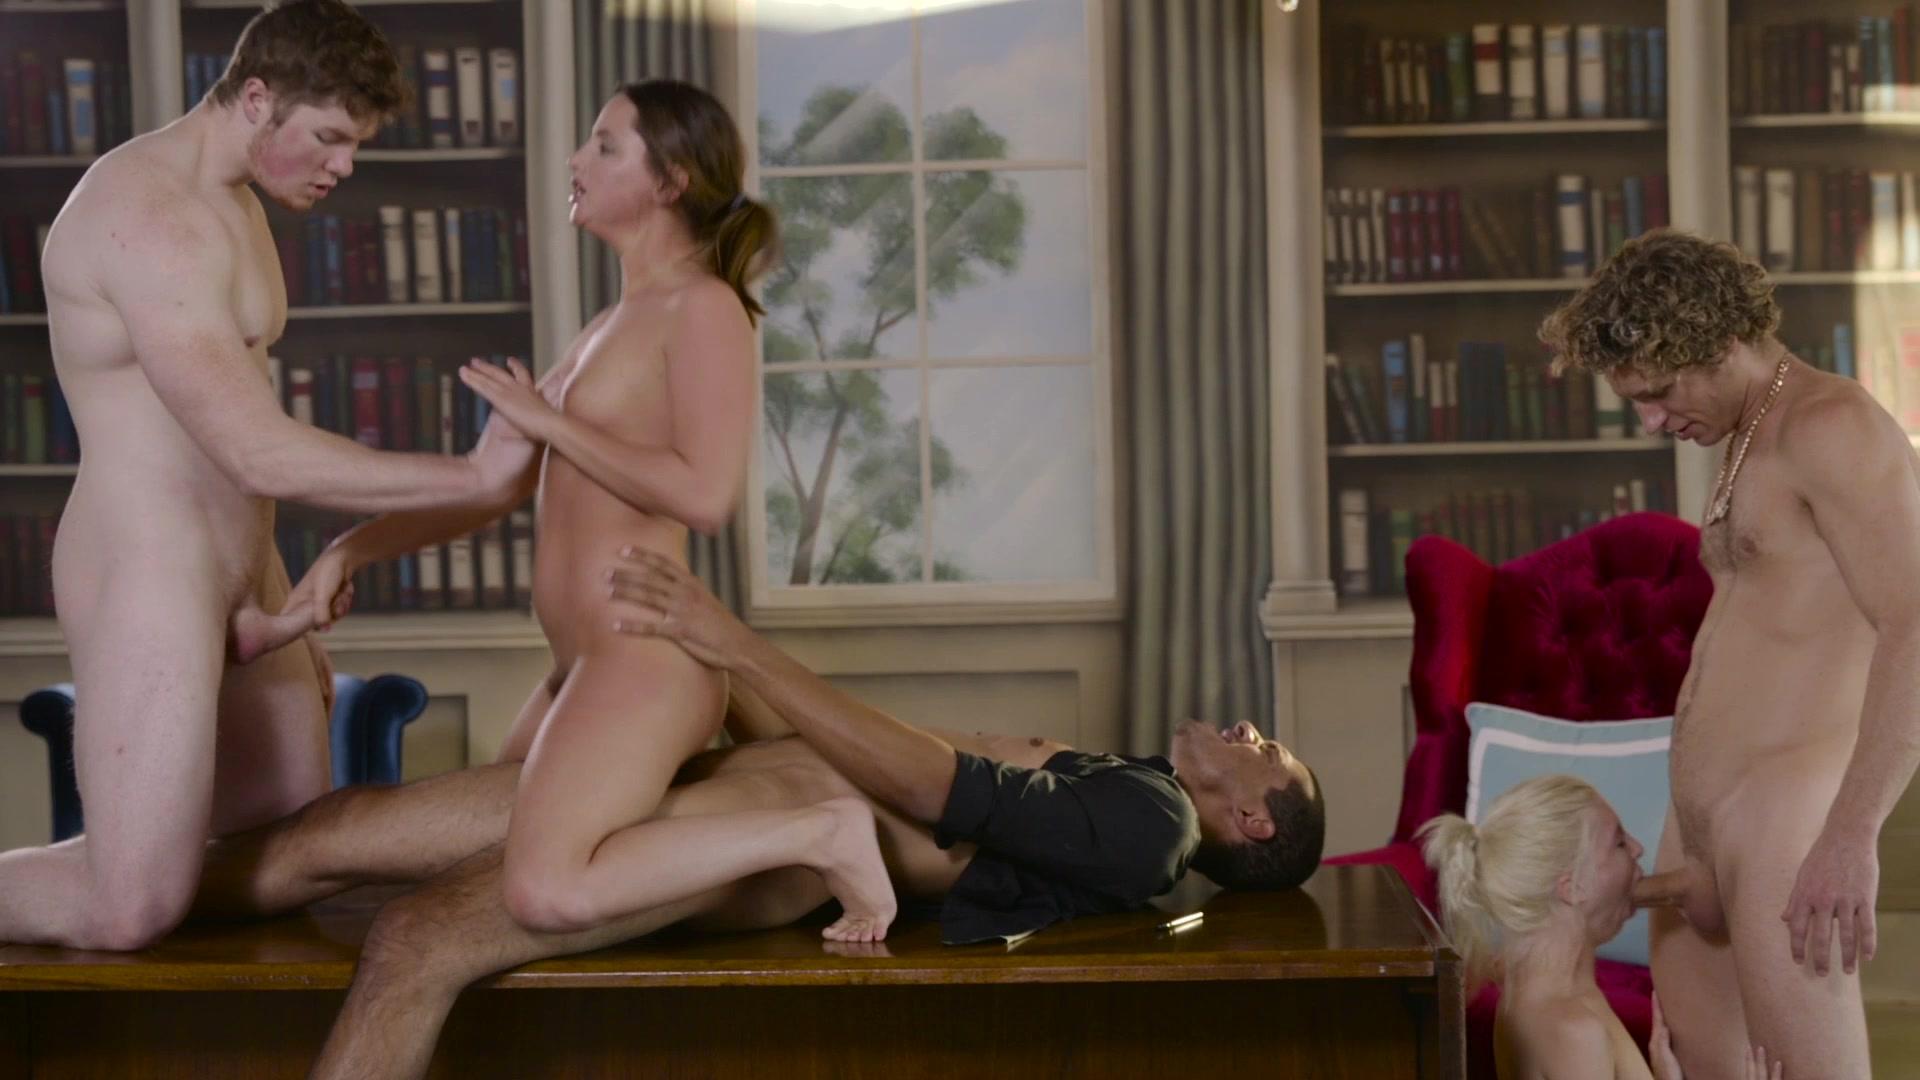 swingers sex scene